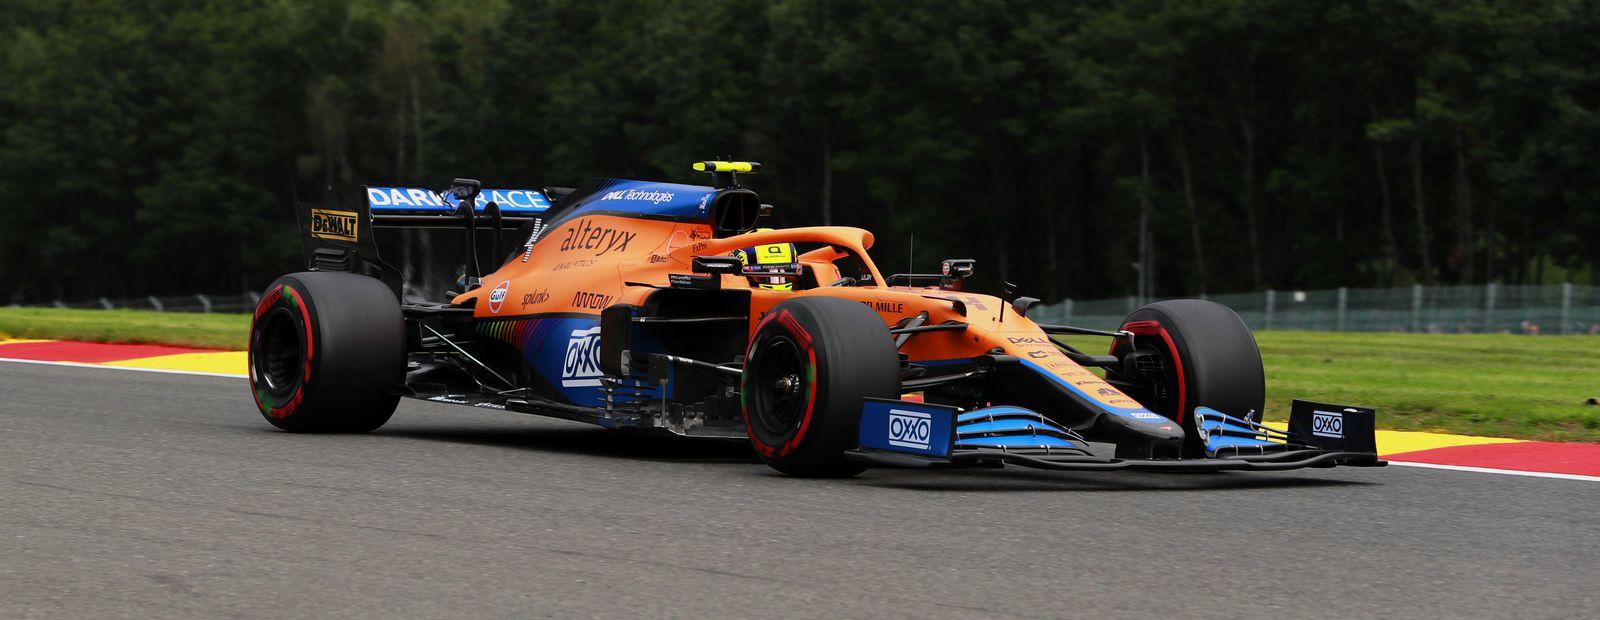 2021 Belgian Grand Prix – Free Practice